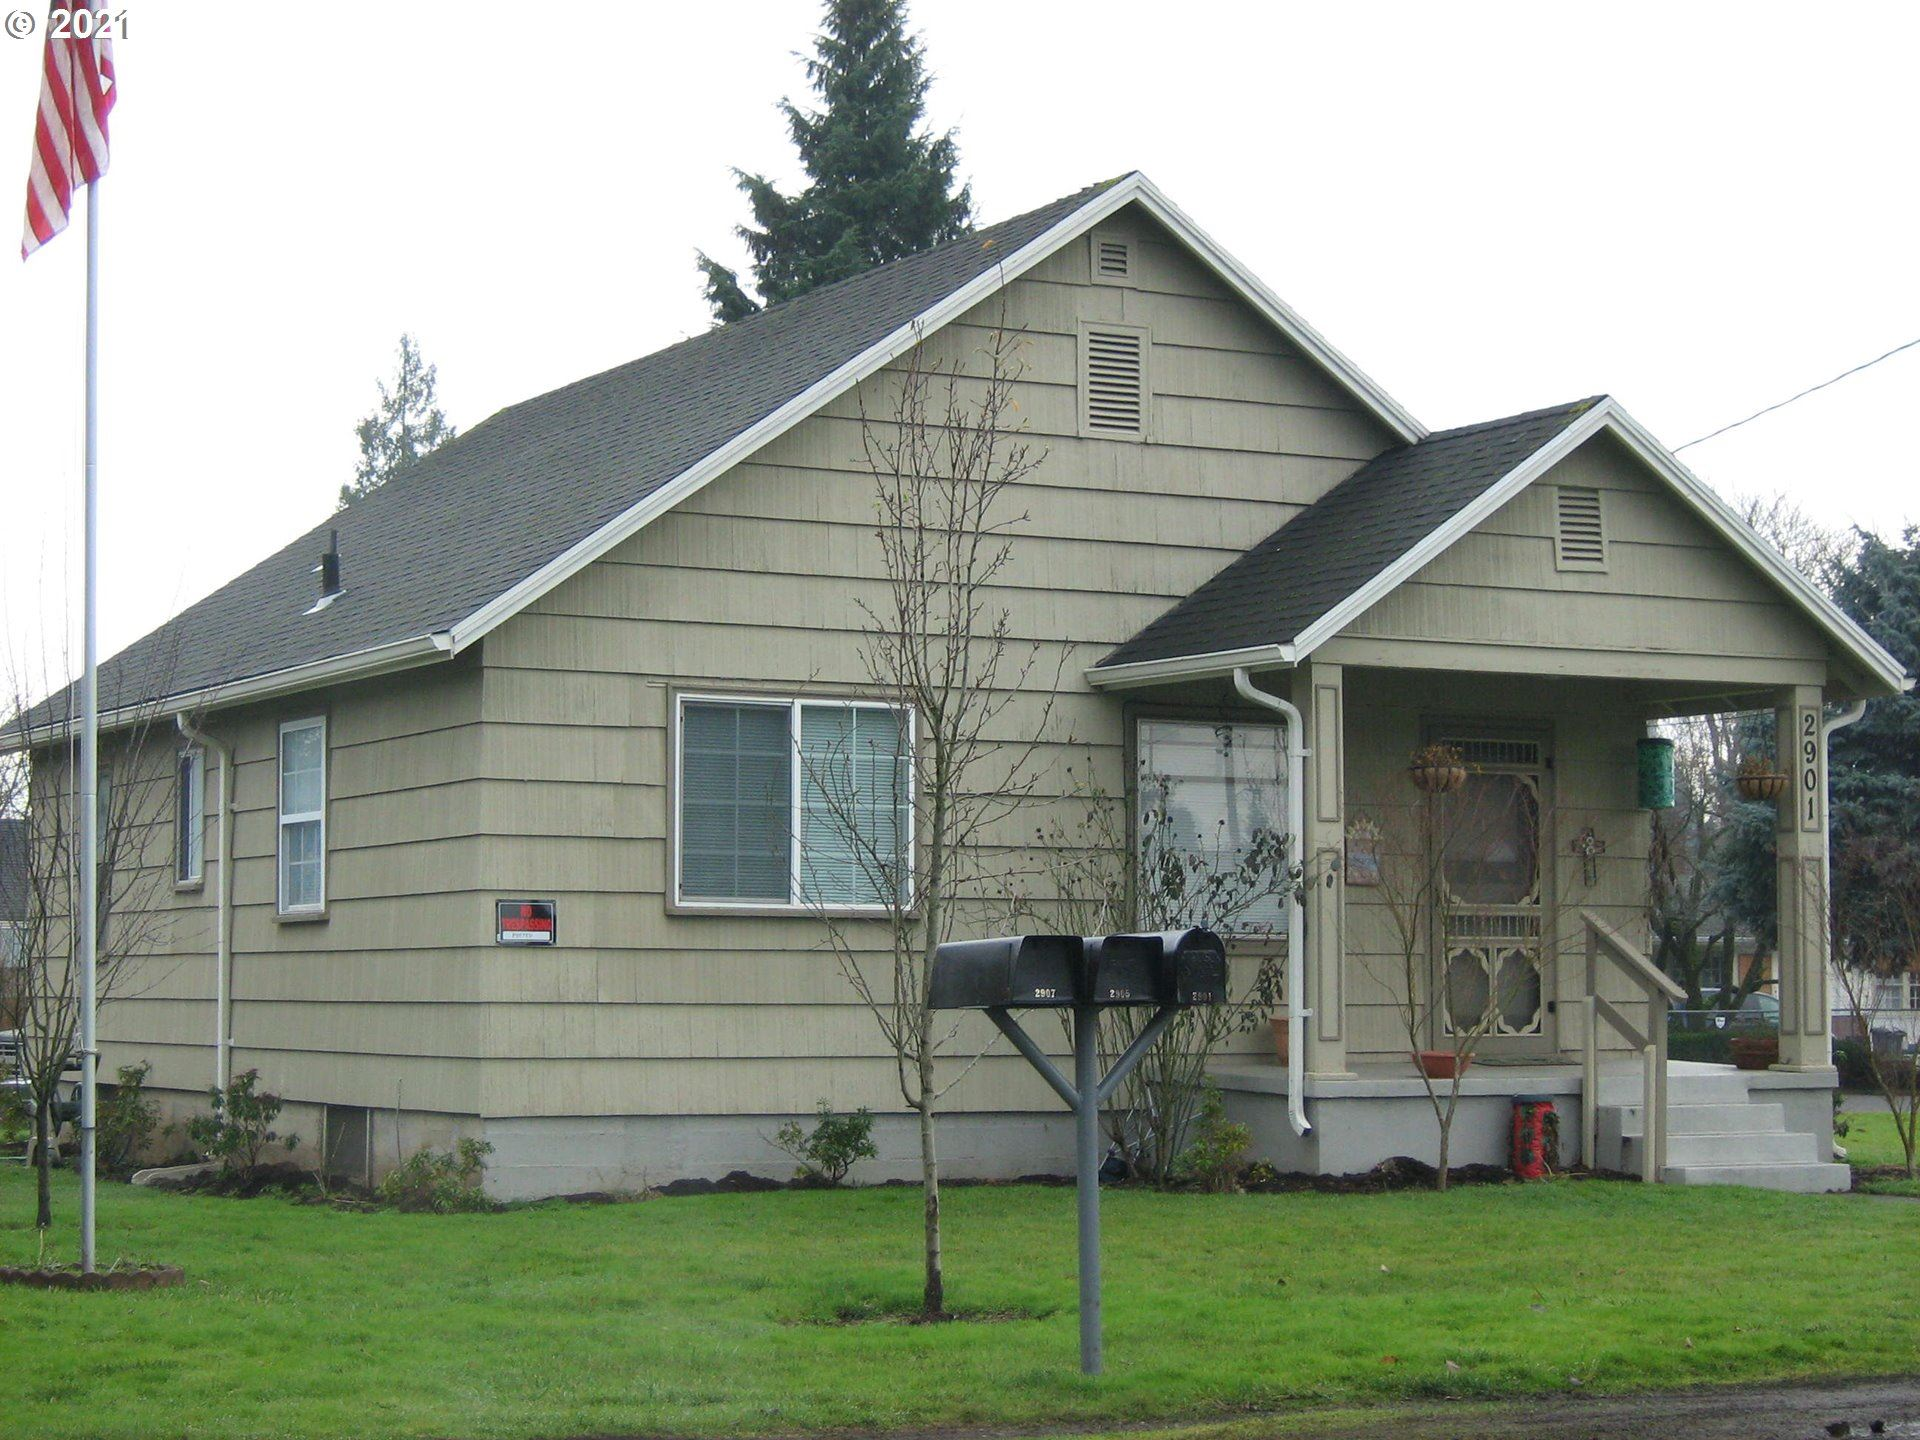 2901 FAIRMOUNT AVE, Vancouver, WA 98661 - MLS#: 21611258